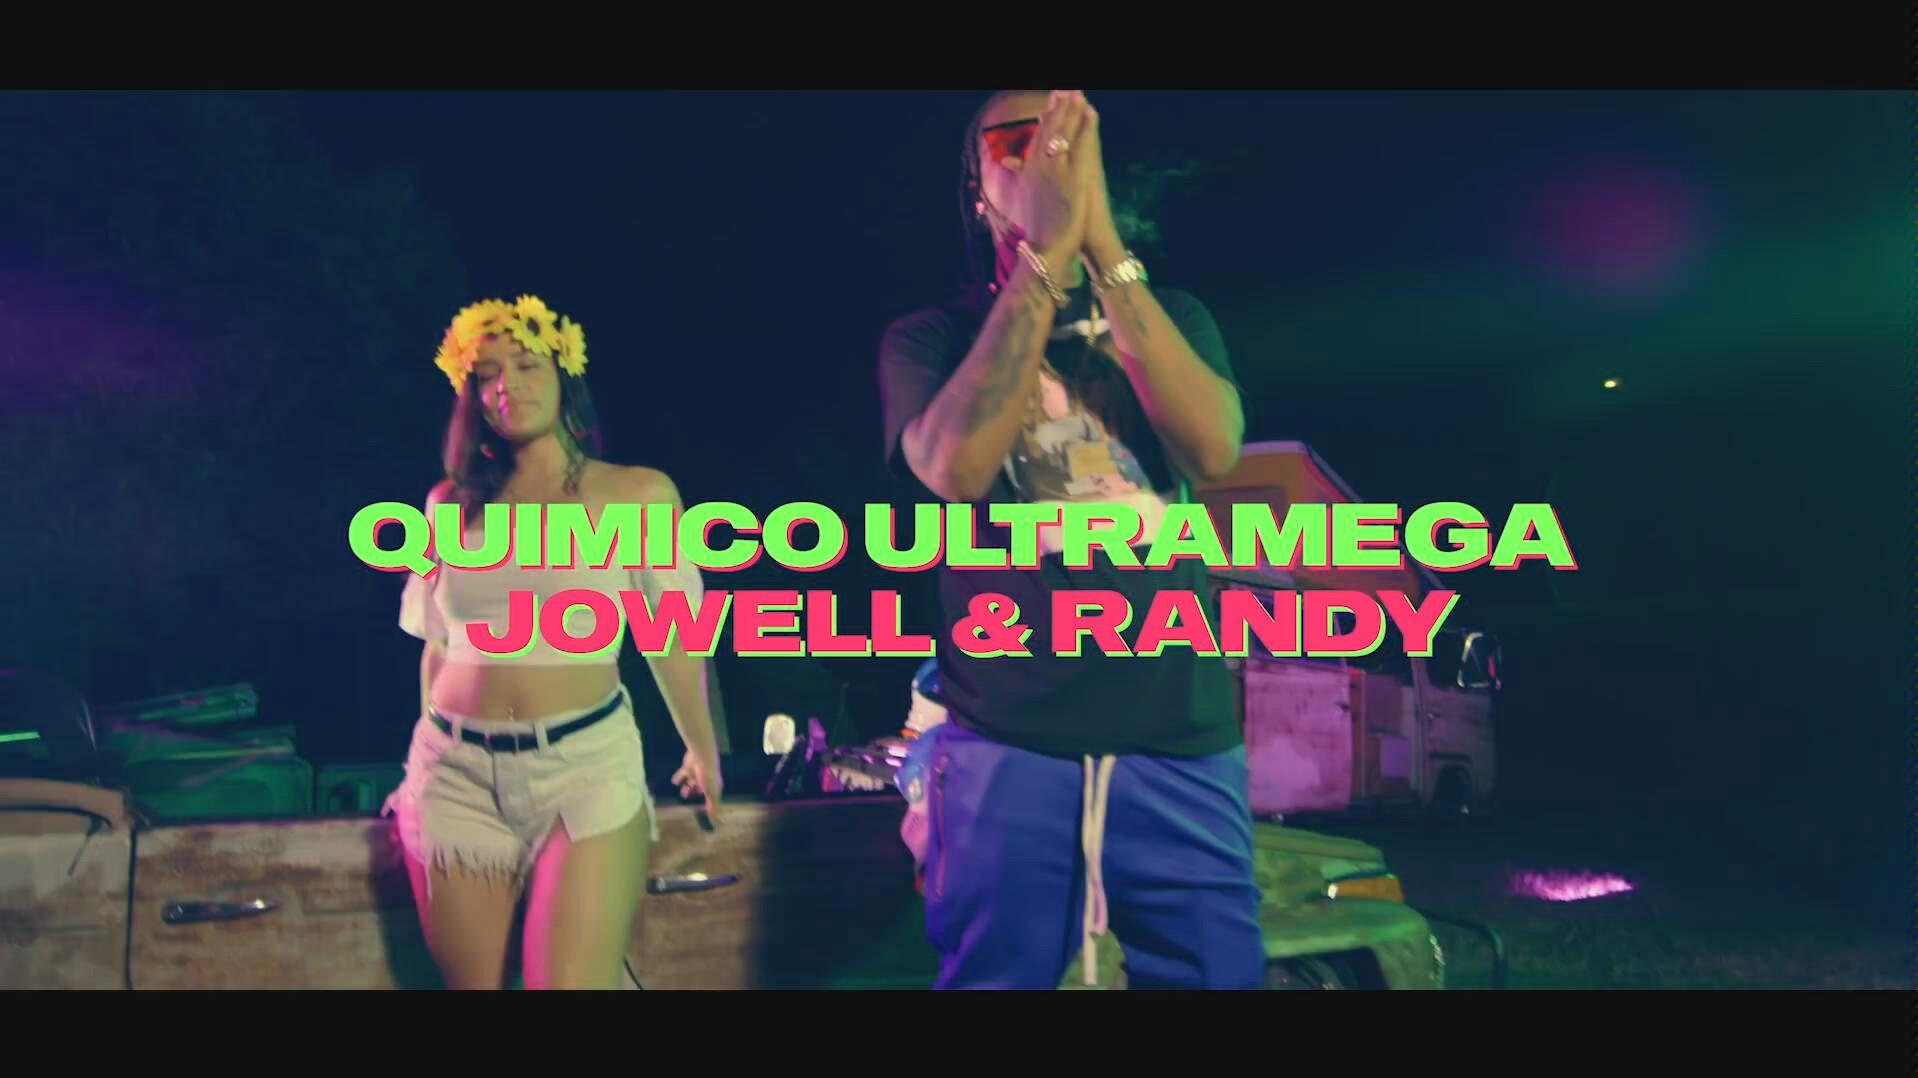 Quimico Ultra Mega, Jowell Y Randy - 《Vamo a Prender》